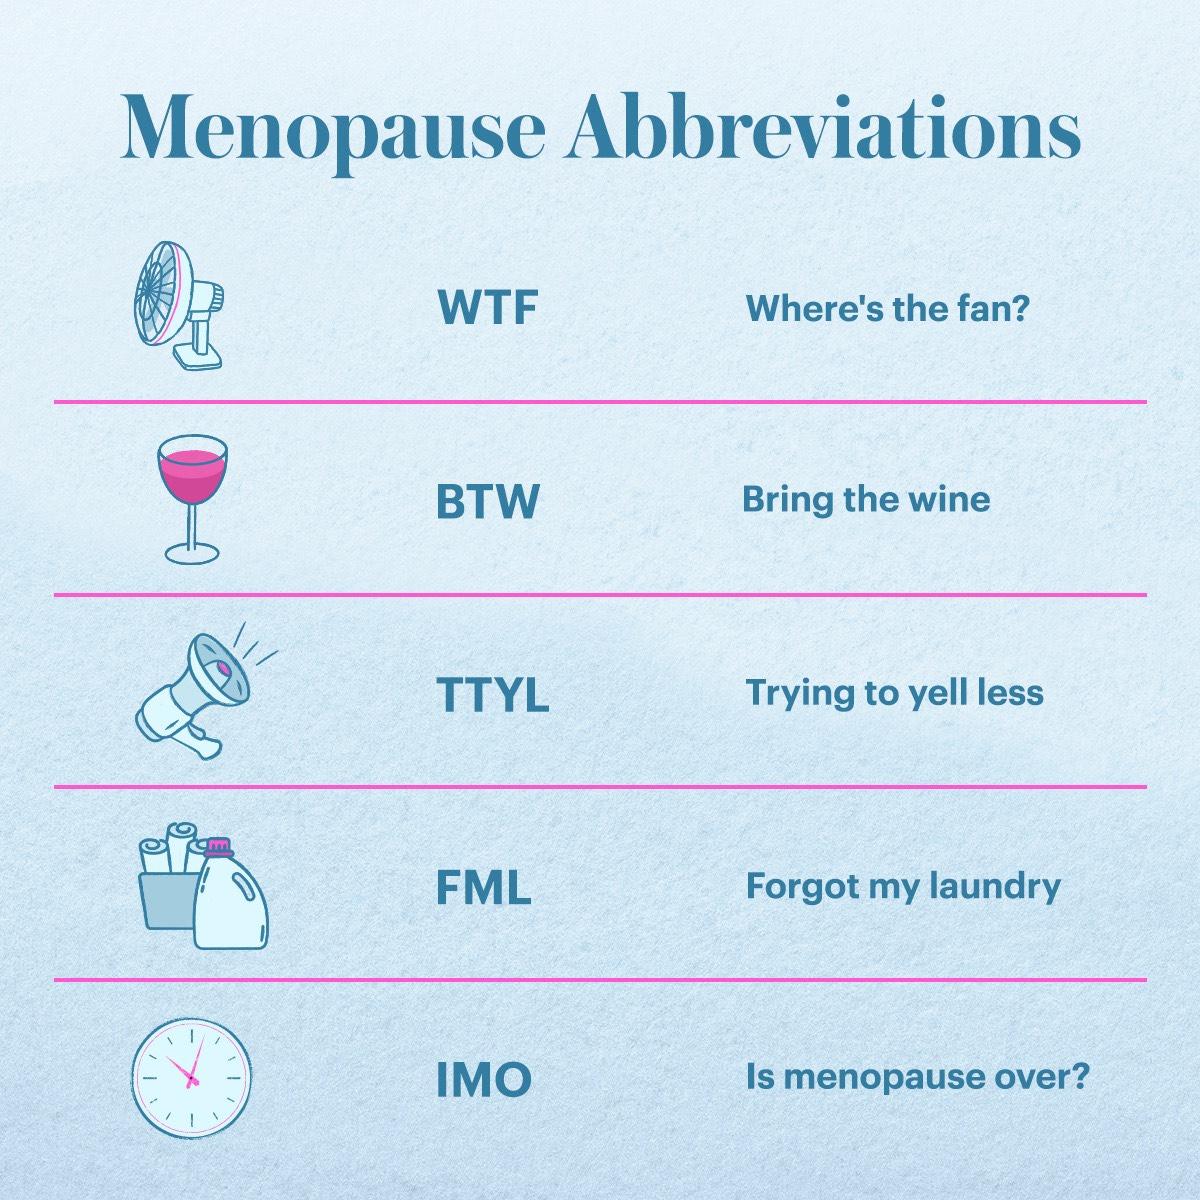 MenopauseAbbreviation-squashed